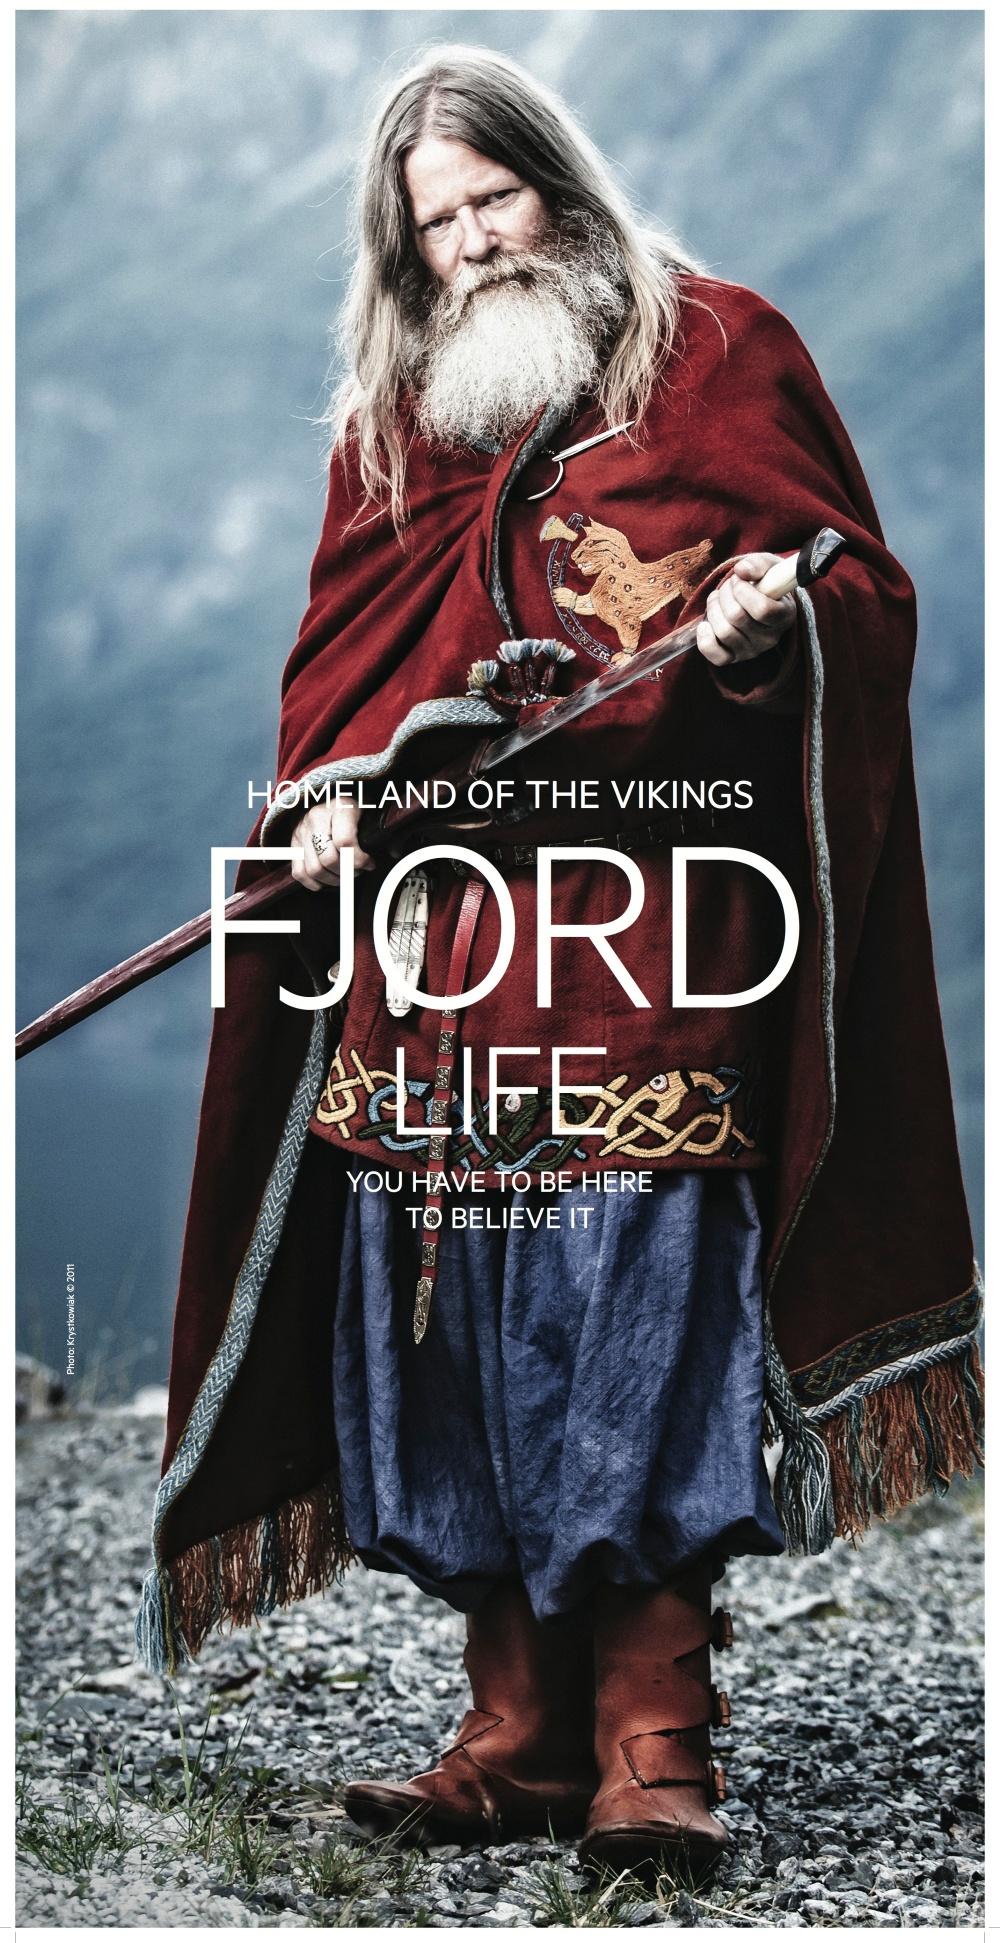 2573_FjordNorway_Viking_TRYKK kopi